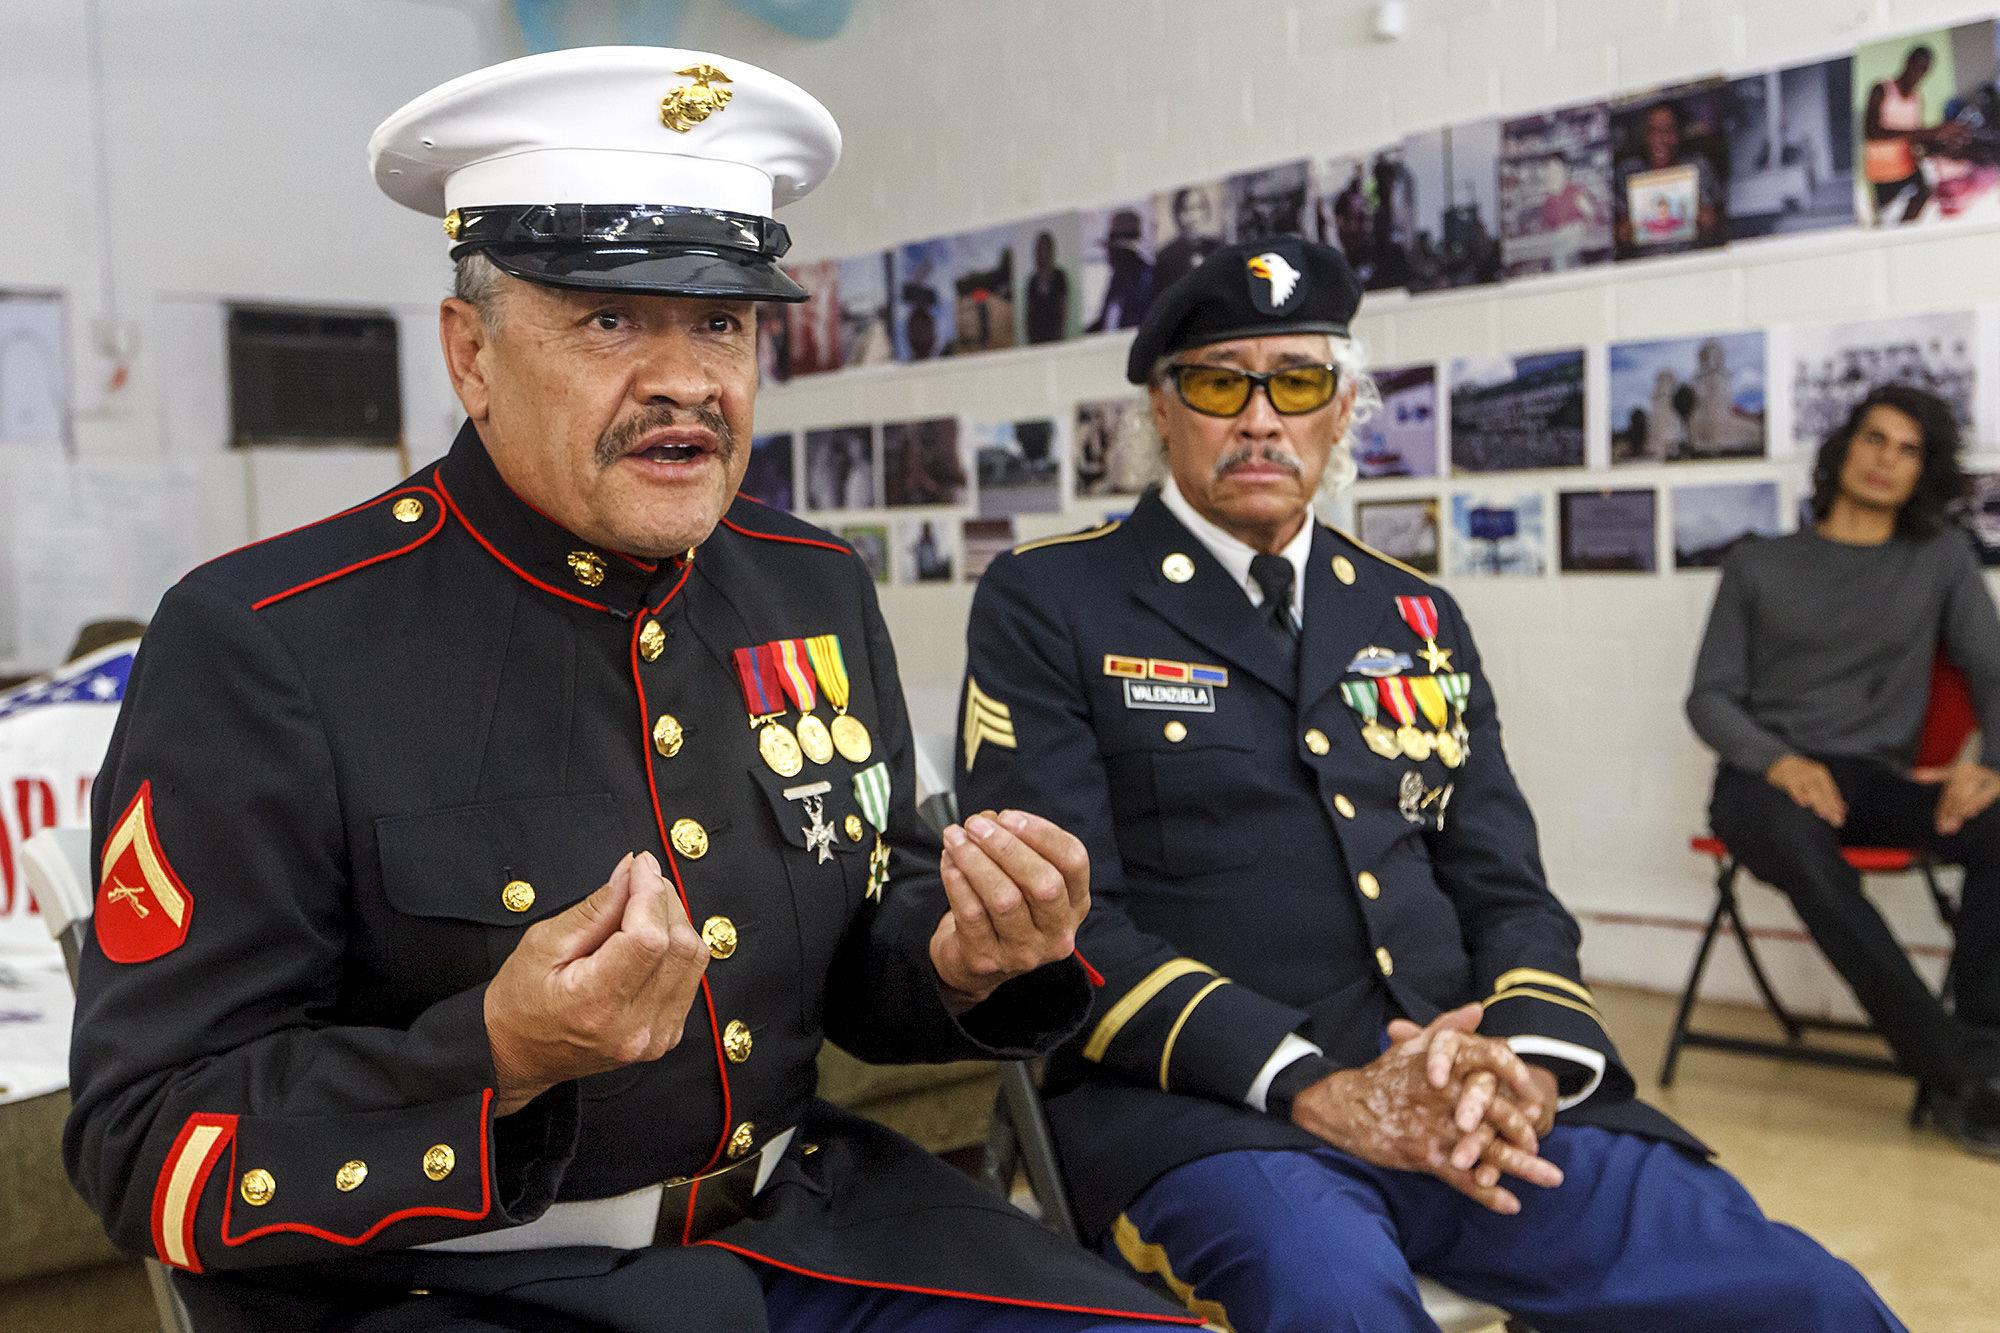 Vietnam veterans at risk of being deported